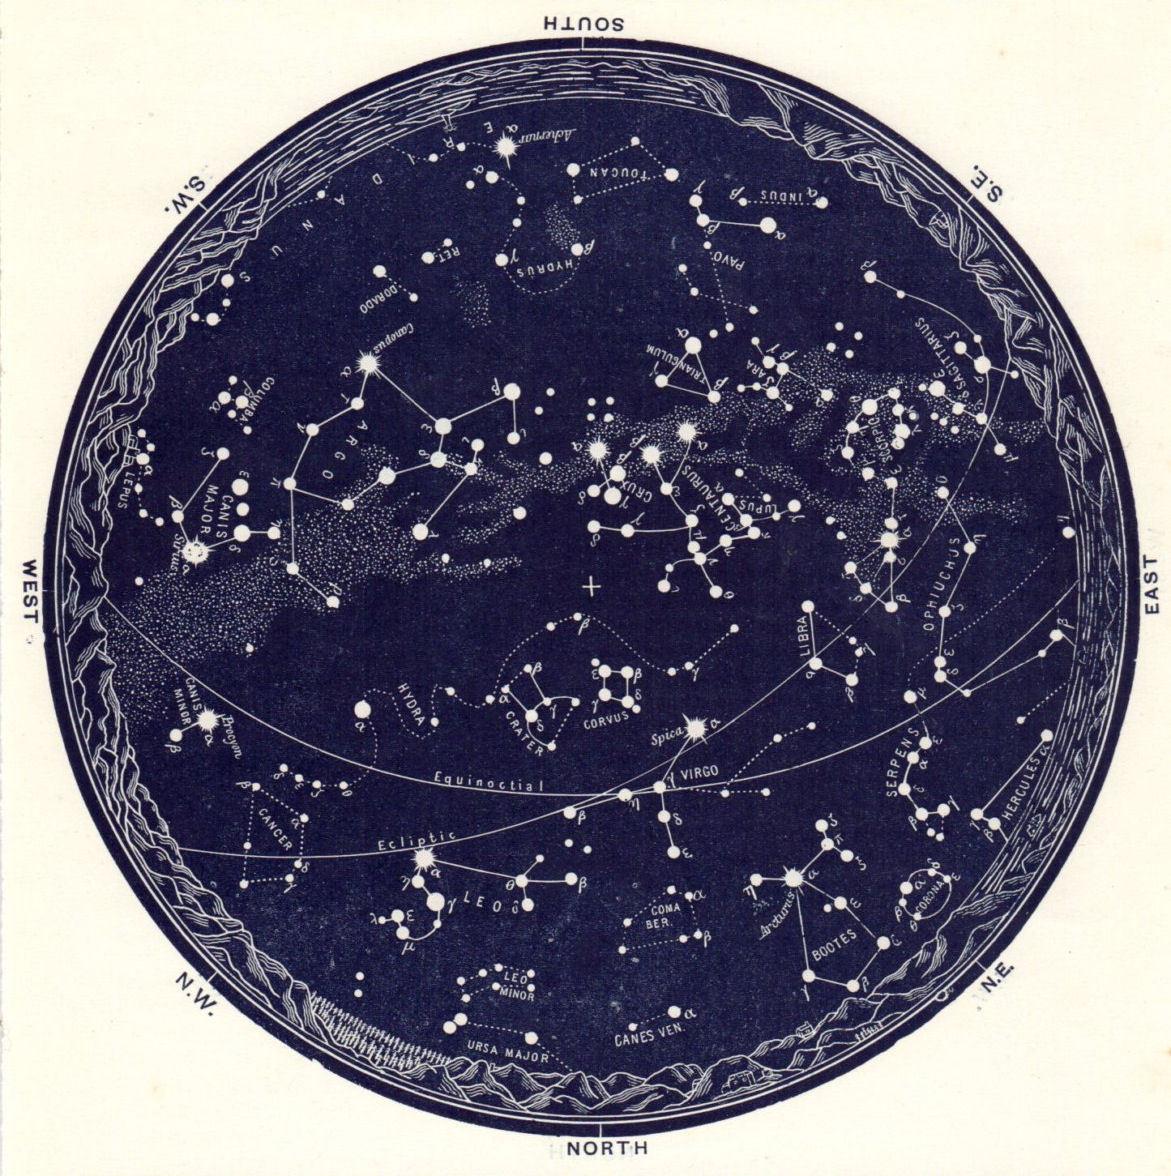 12u00 X 12u00 Poster U00 Vintage Star Map Of